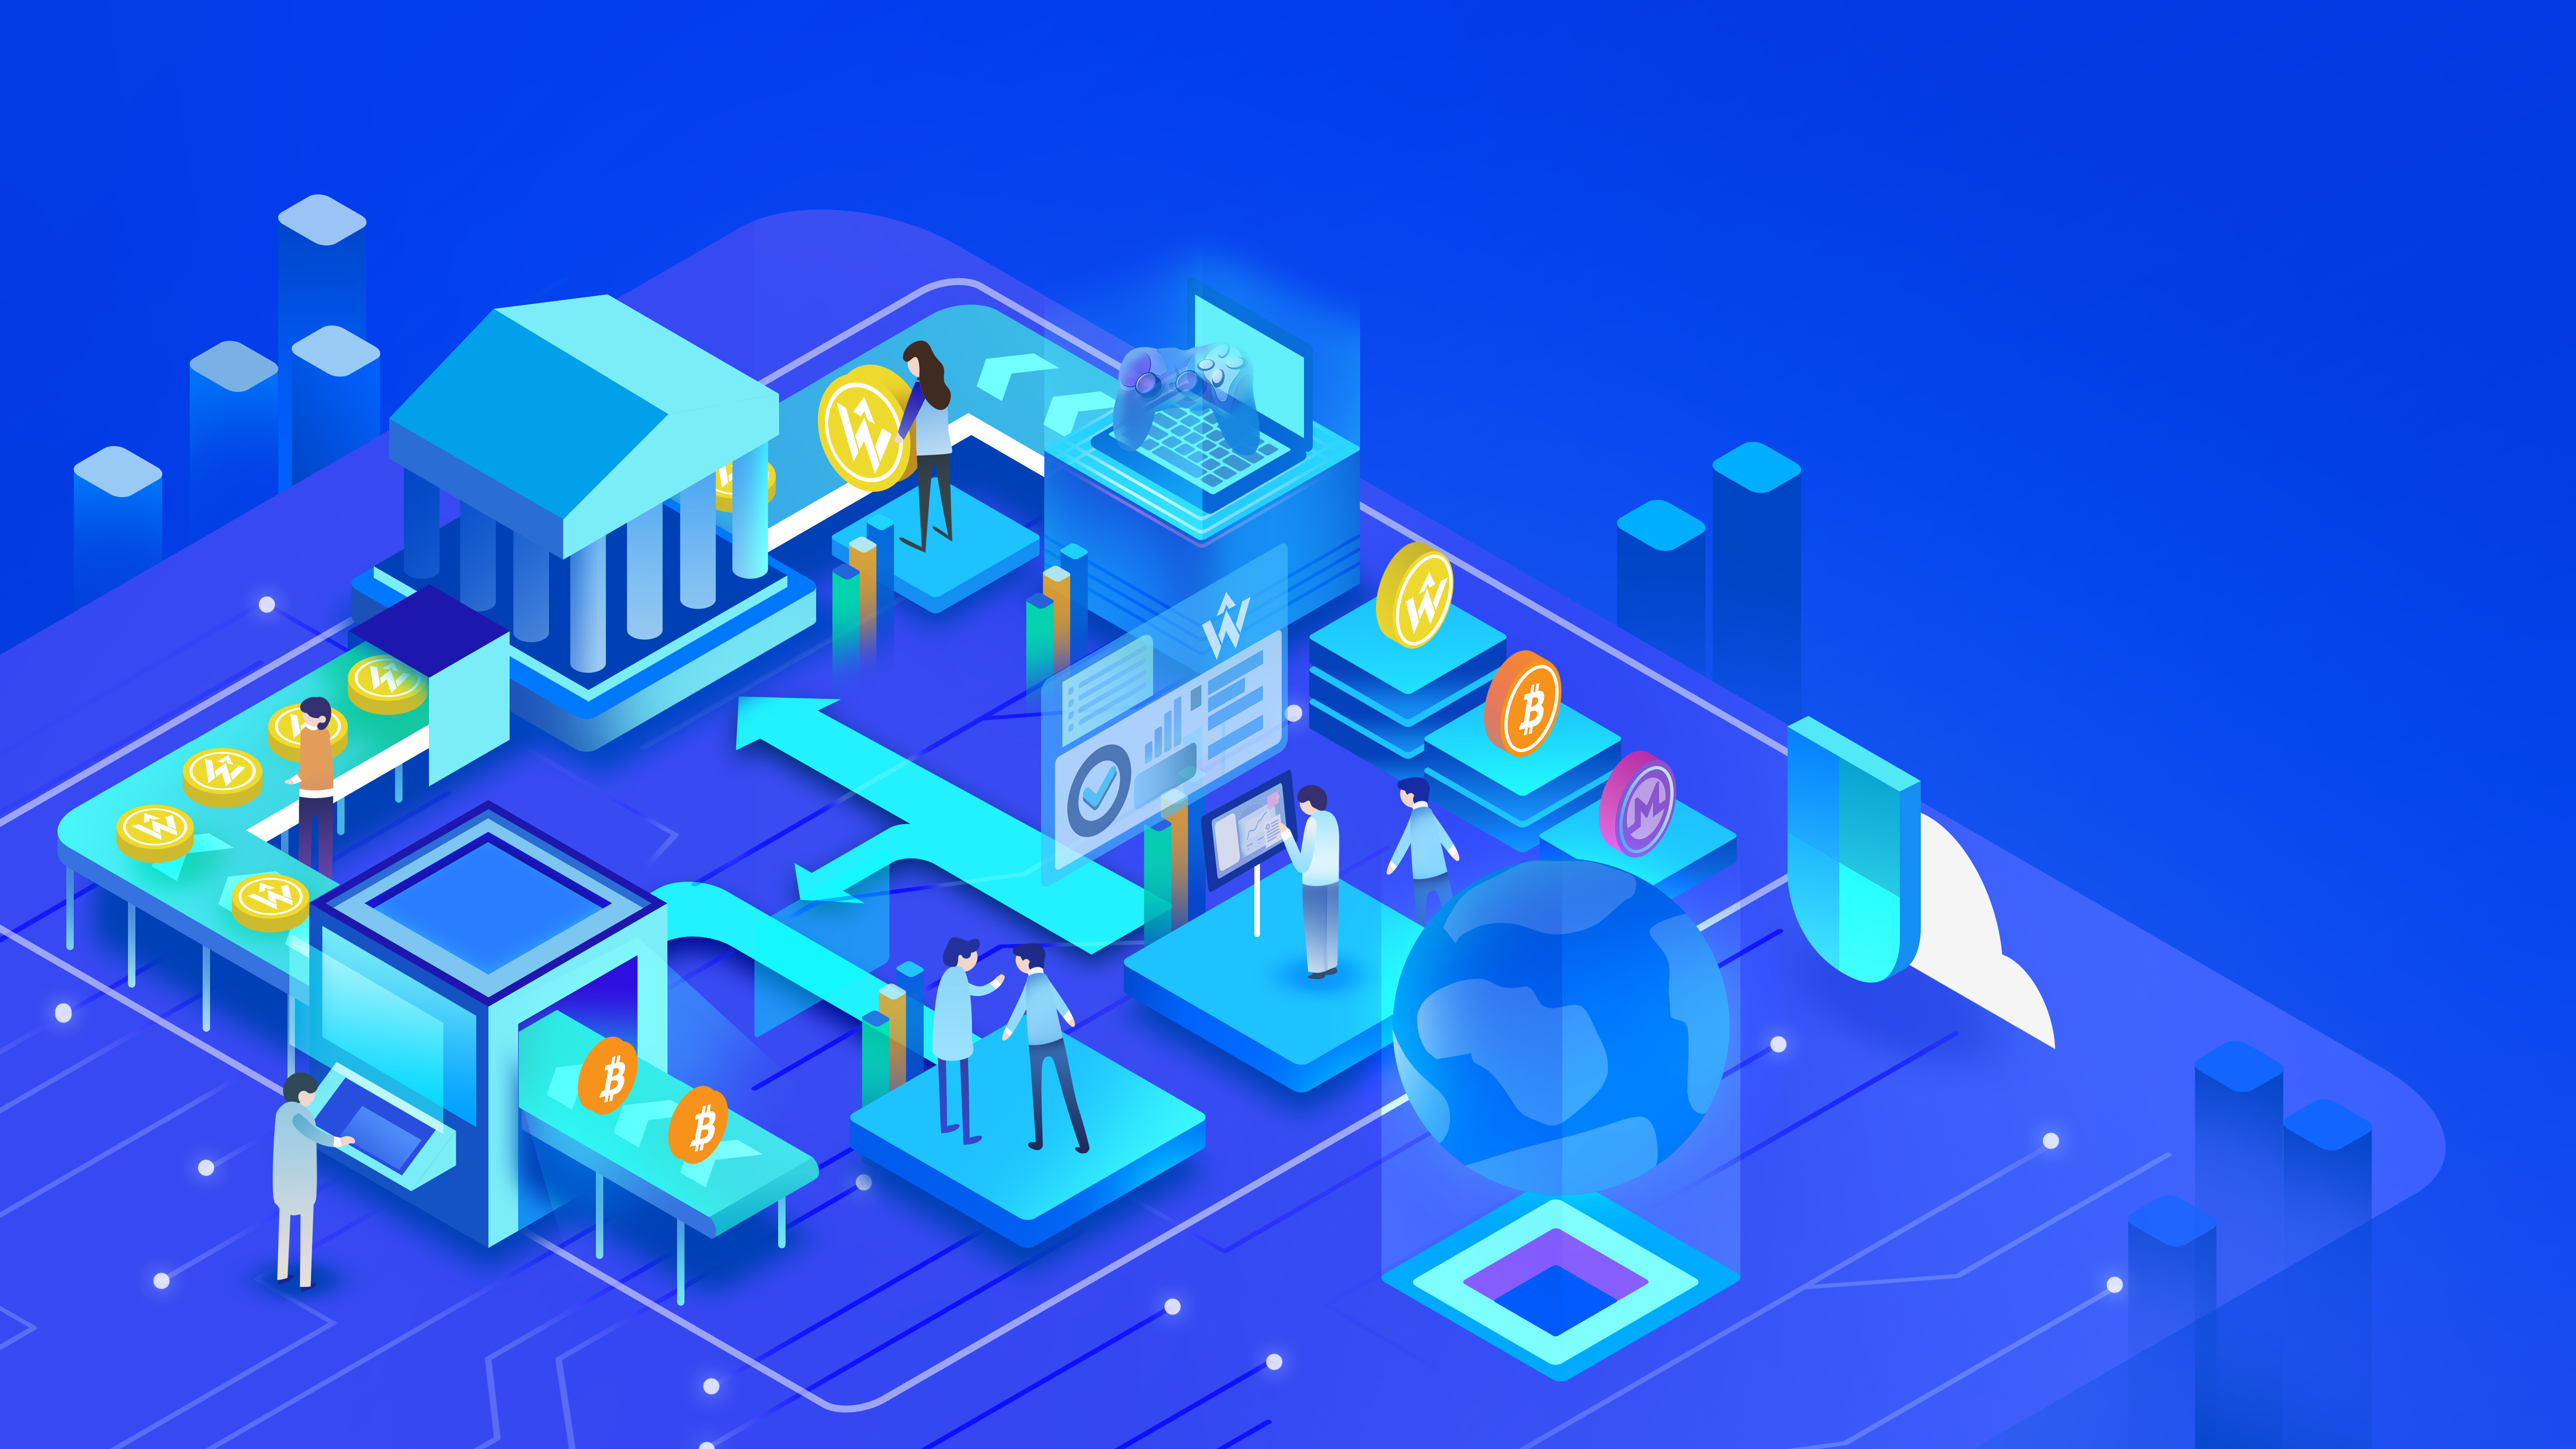 World open network platform